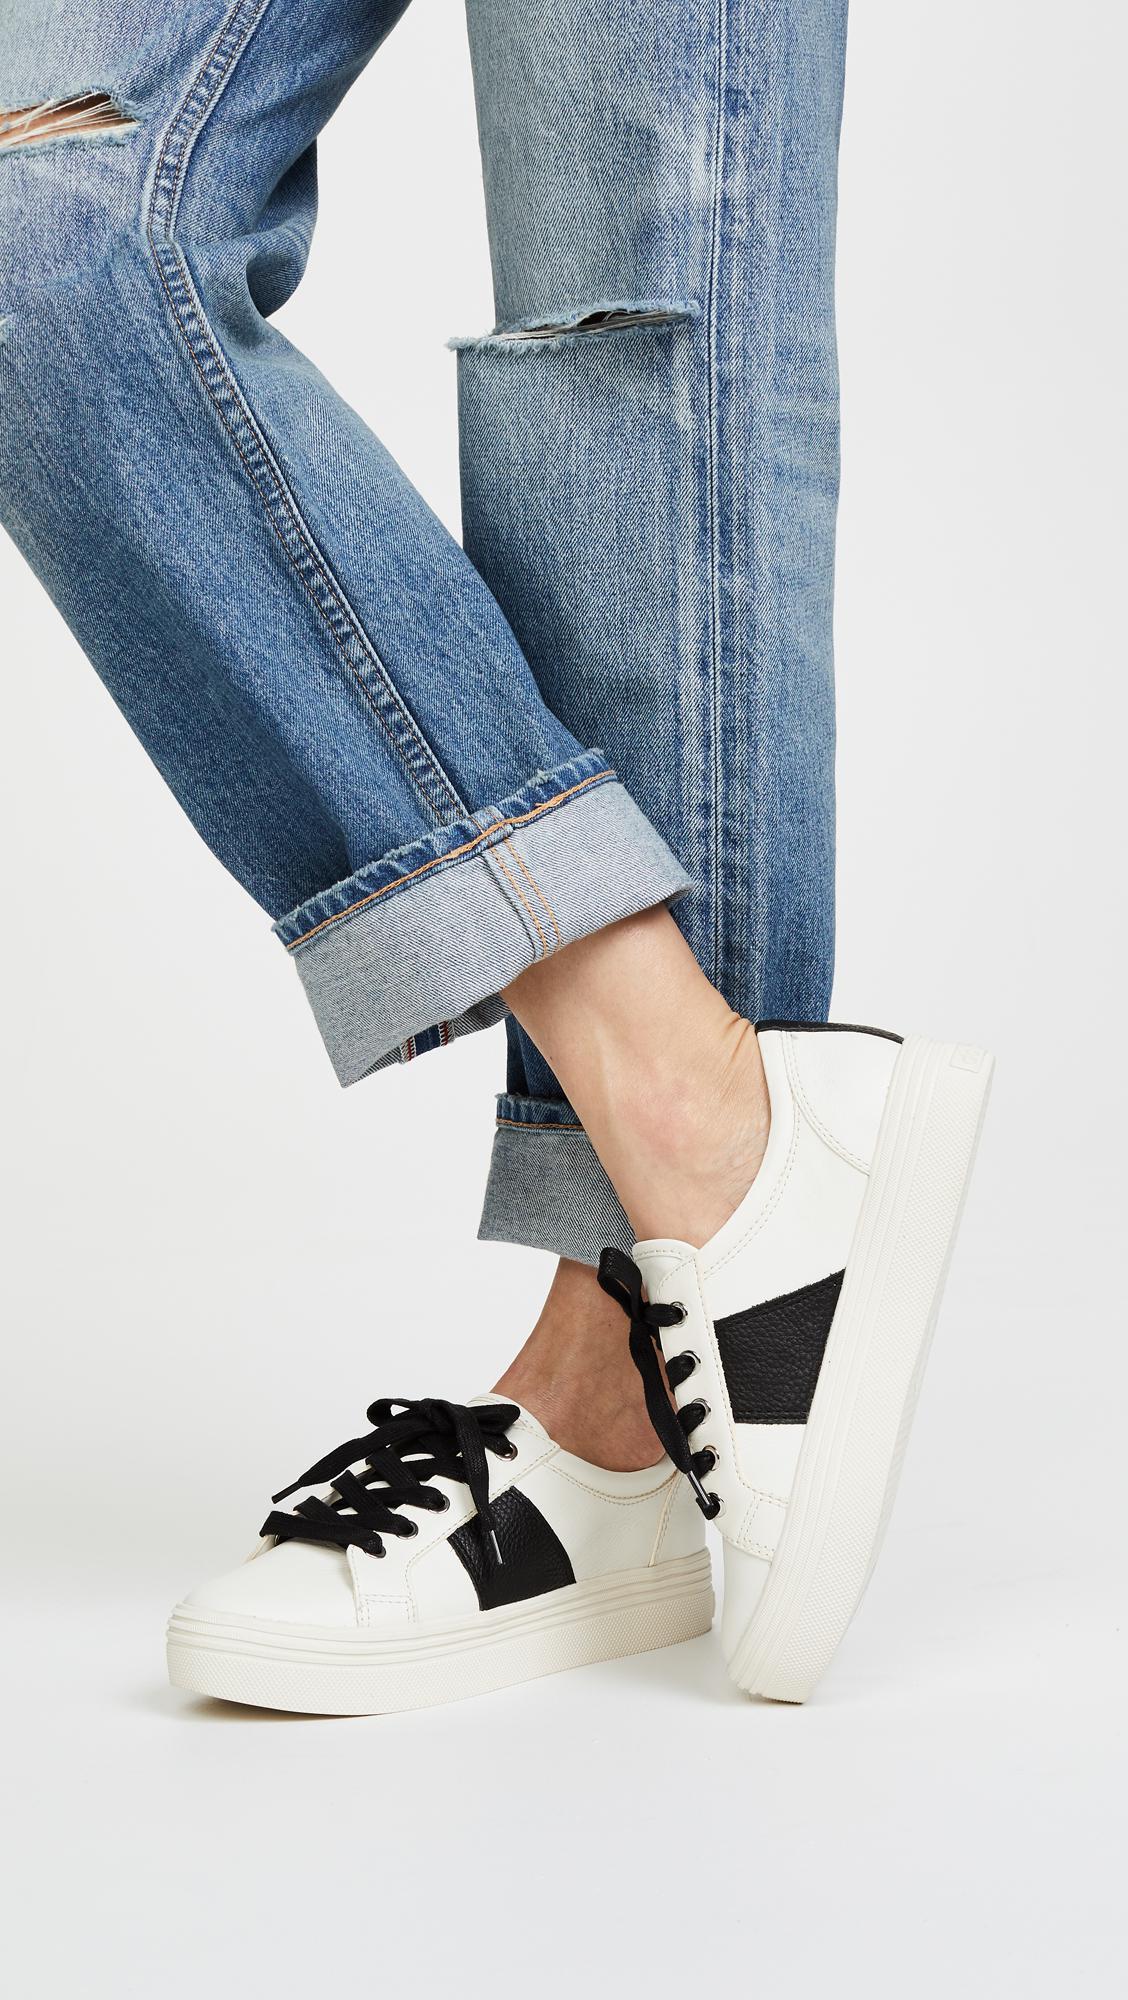 Dolce Vita Women's Tavina Leather Lace Up Platform Sneakers Wholesale Quality IQQnctMqEs